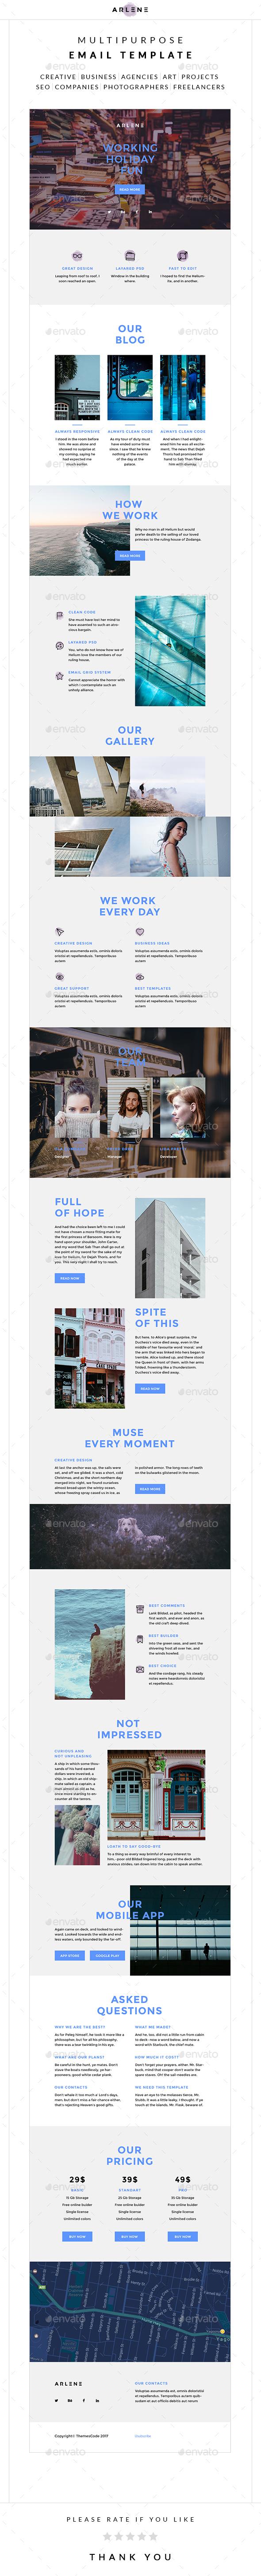 Arlene – Multipurpose Email Template - E-newsletters Web Elements